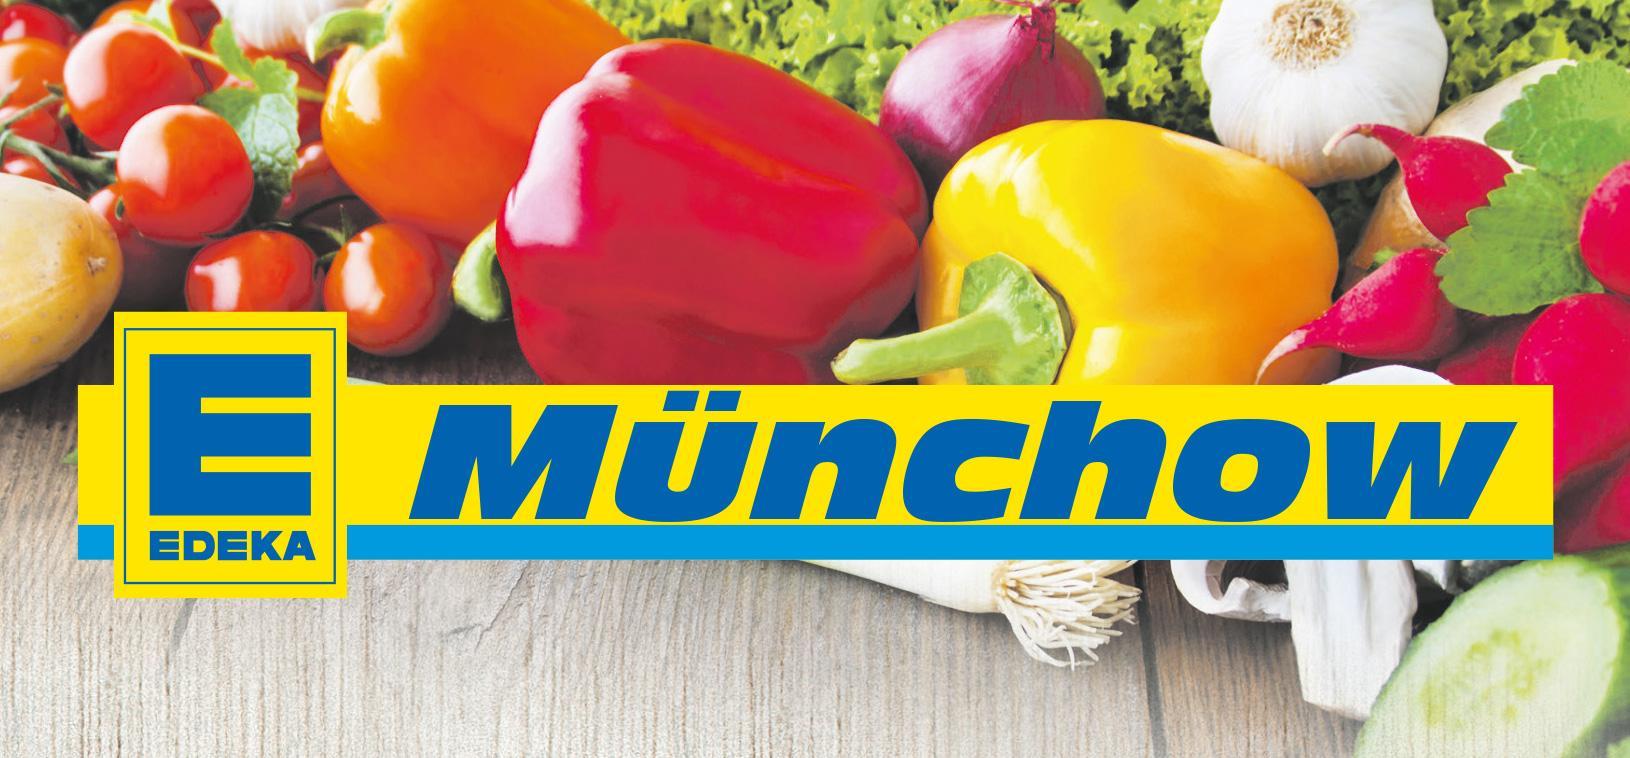 E neukauf Münchow Moos - Münchow EDEKA Märkte